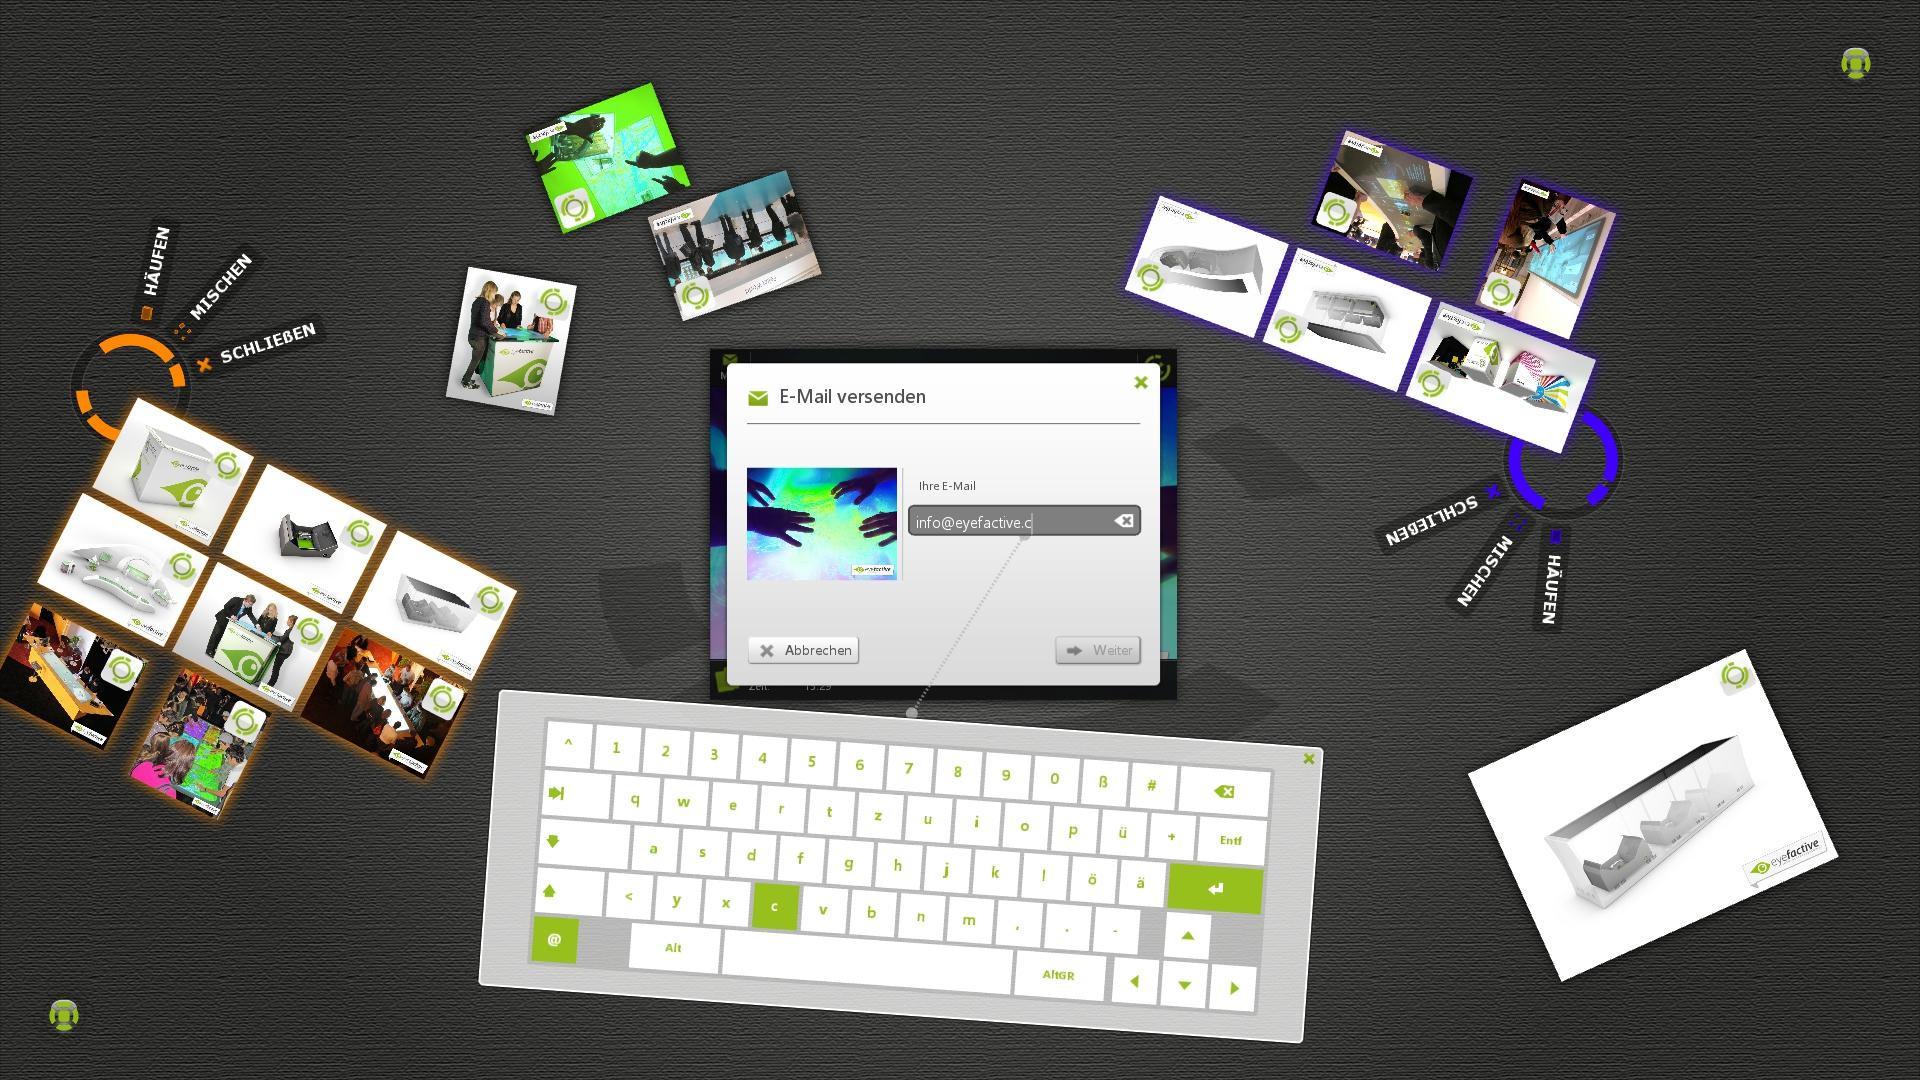 Multimedia-App: LivePhoto